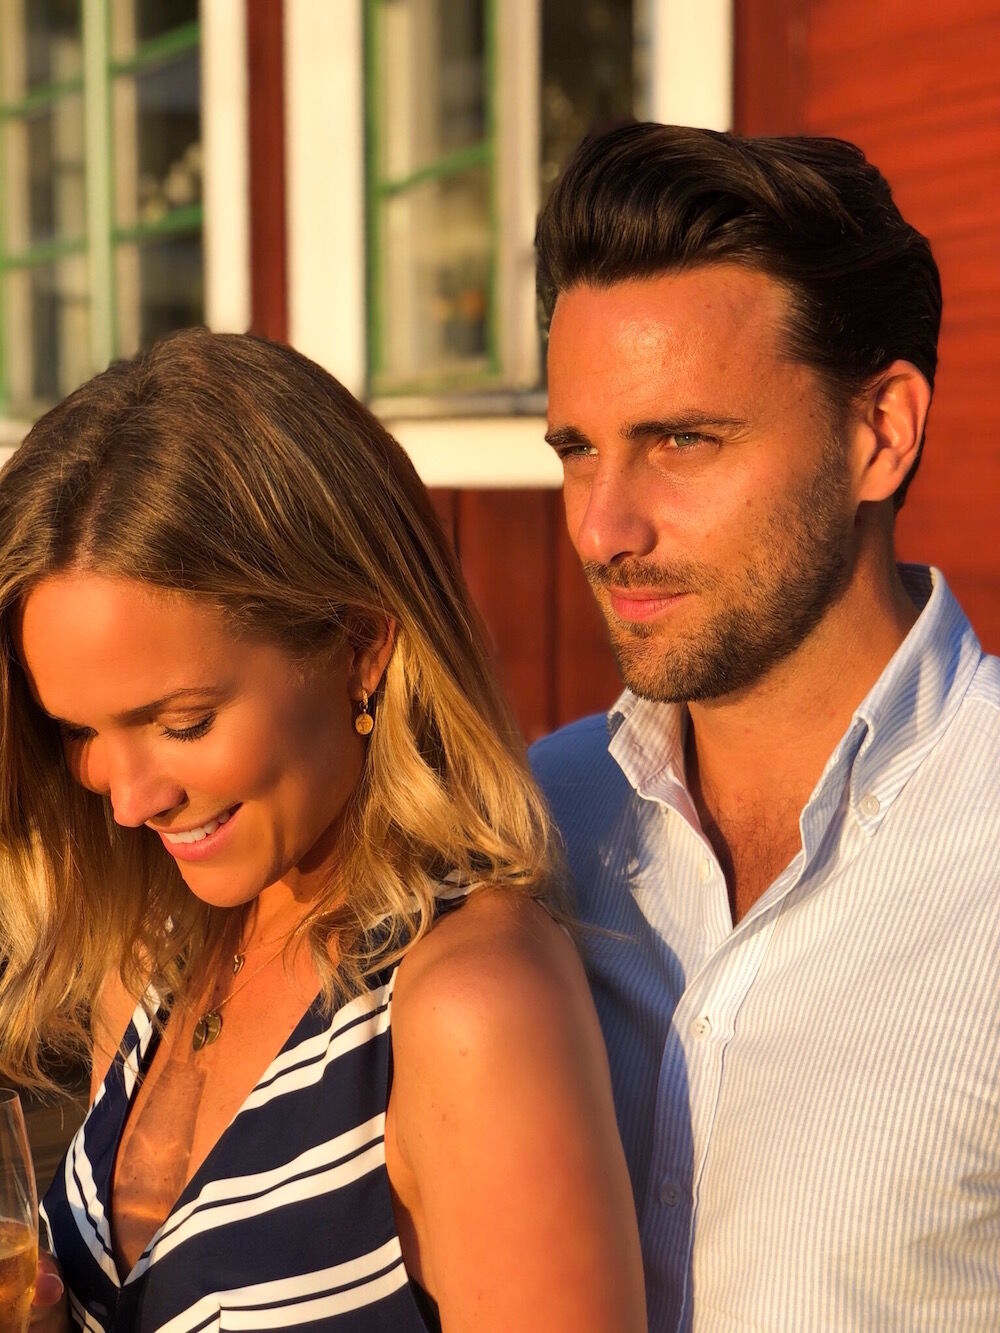 Free christian internet dating sites online - newswedishmedicine